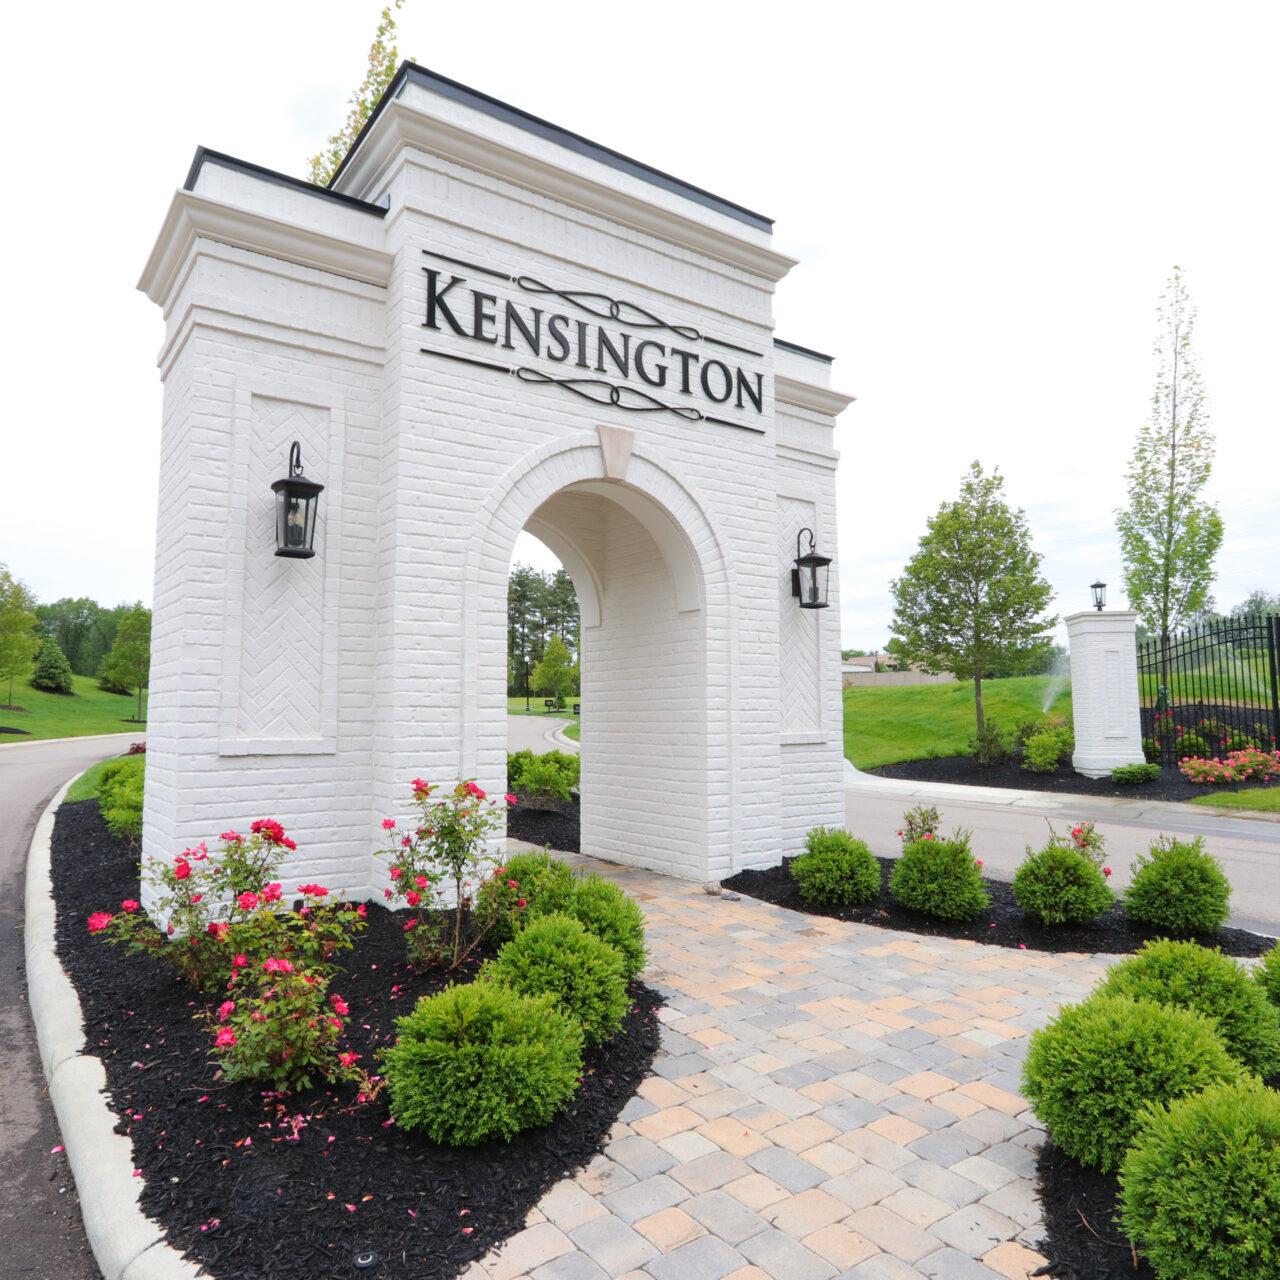 Kensington Entrance